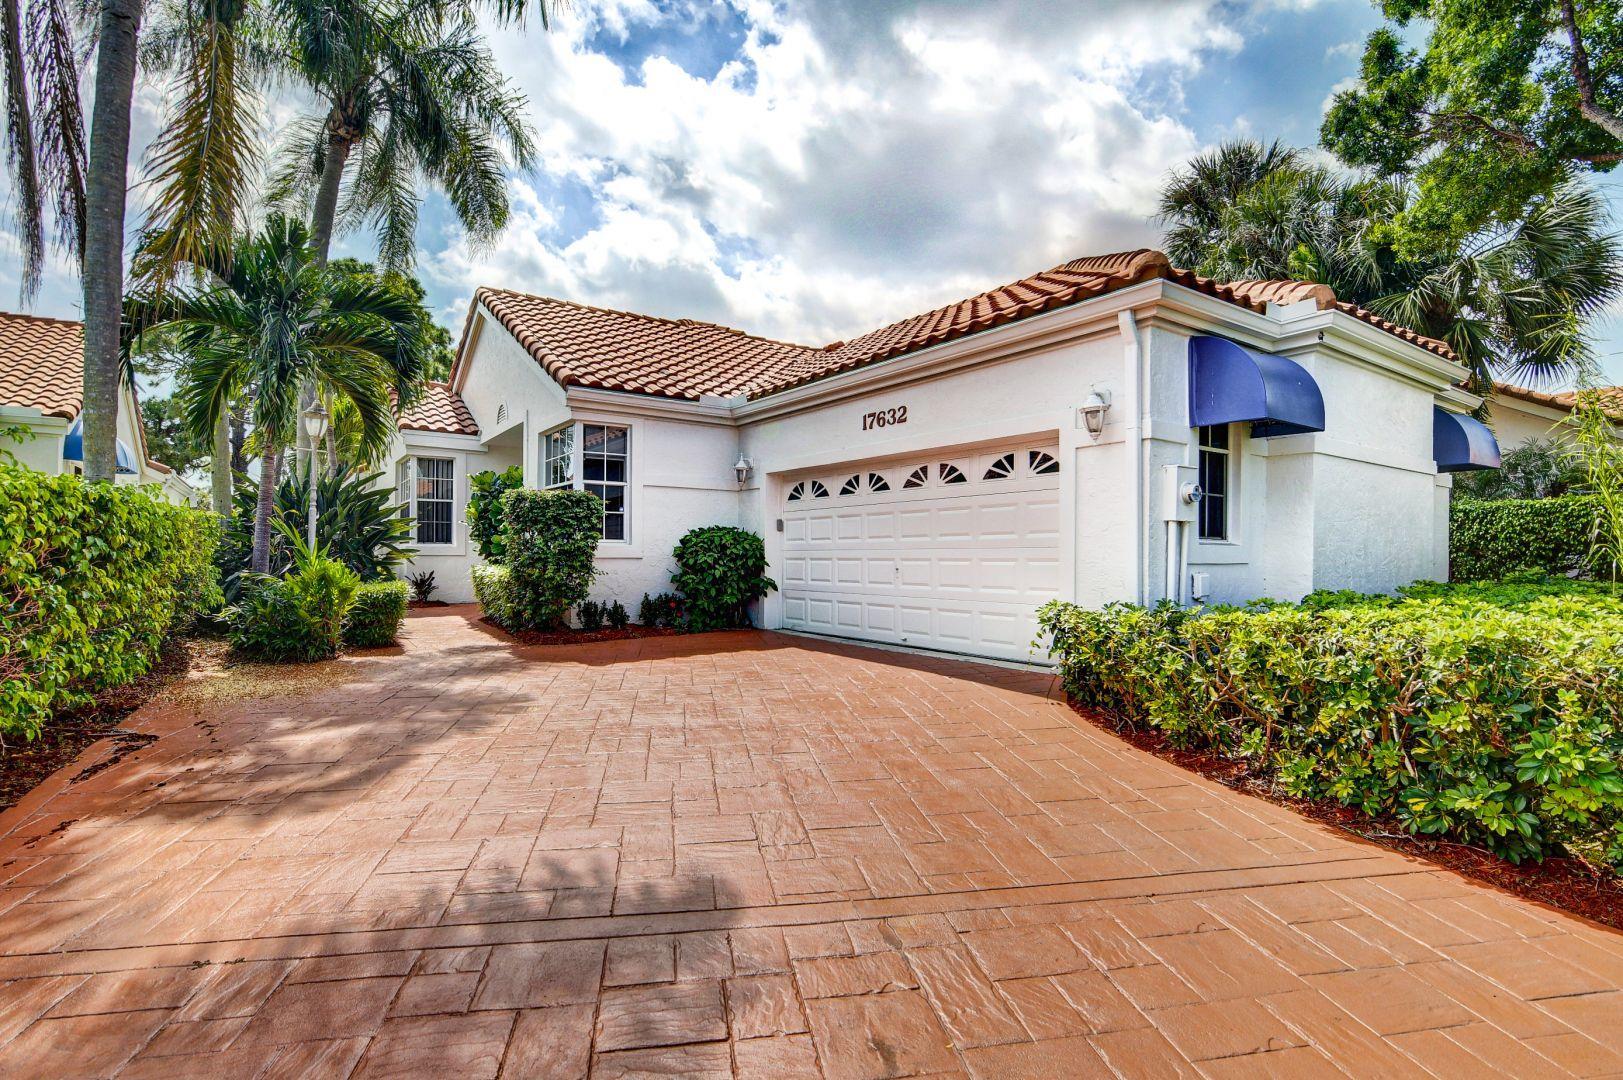 17632 Candlewood Terrace, Boca Raton, FL 33487